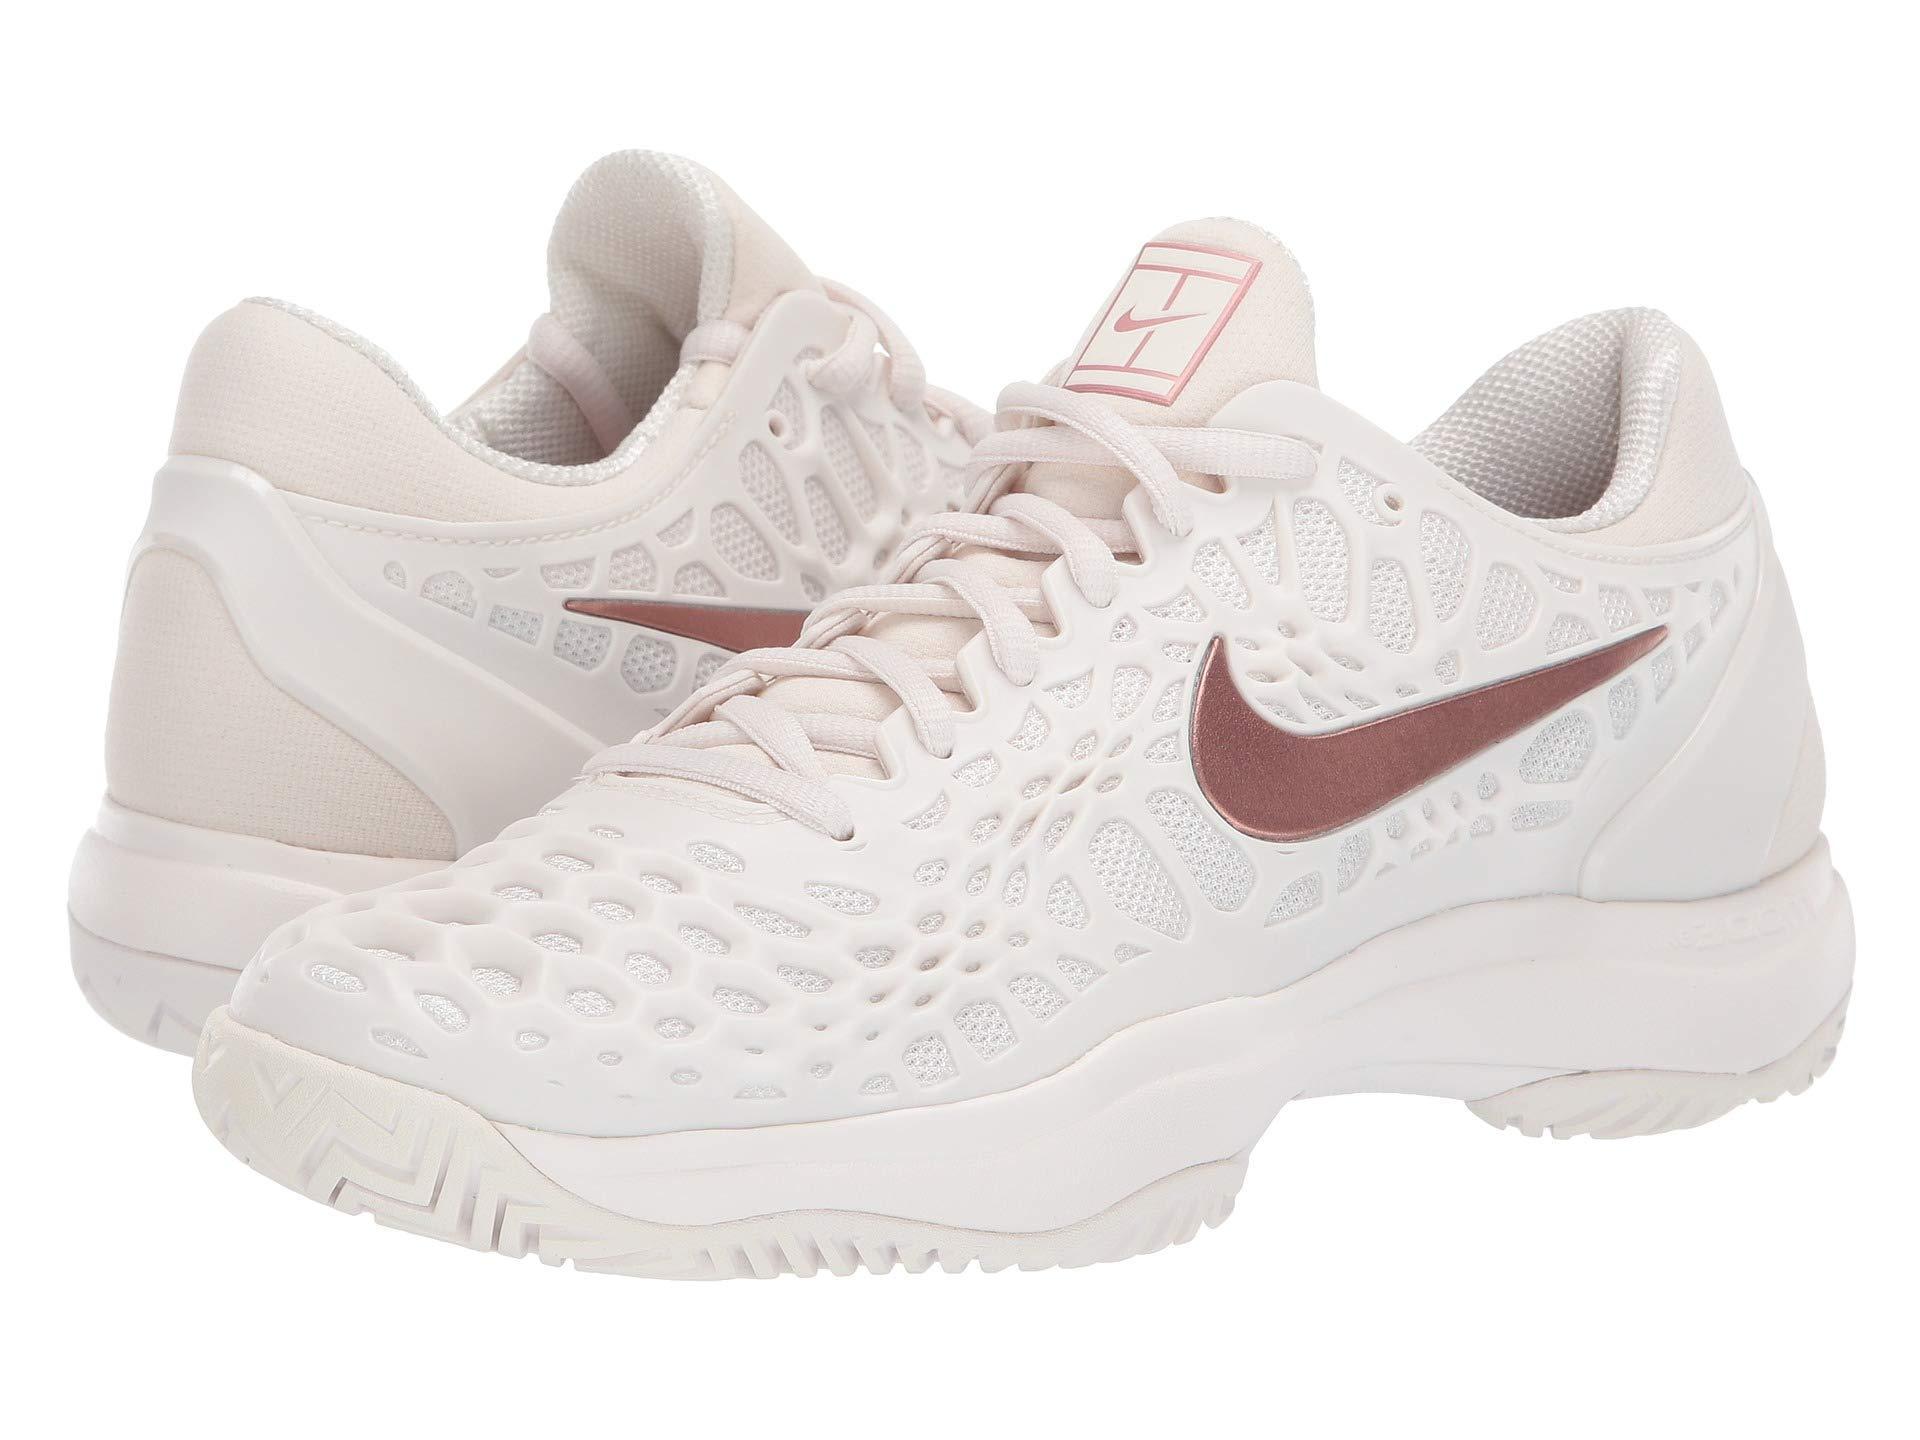 655fc2ad6d9f Nike. Zoom Cage 3 Hc (phantom metallic Rose Gold rose Gold) Women s Tennis  Shoes